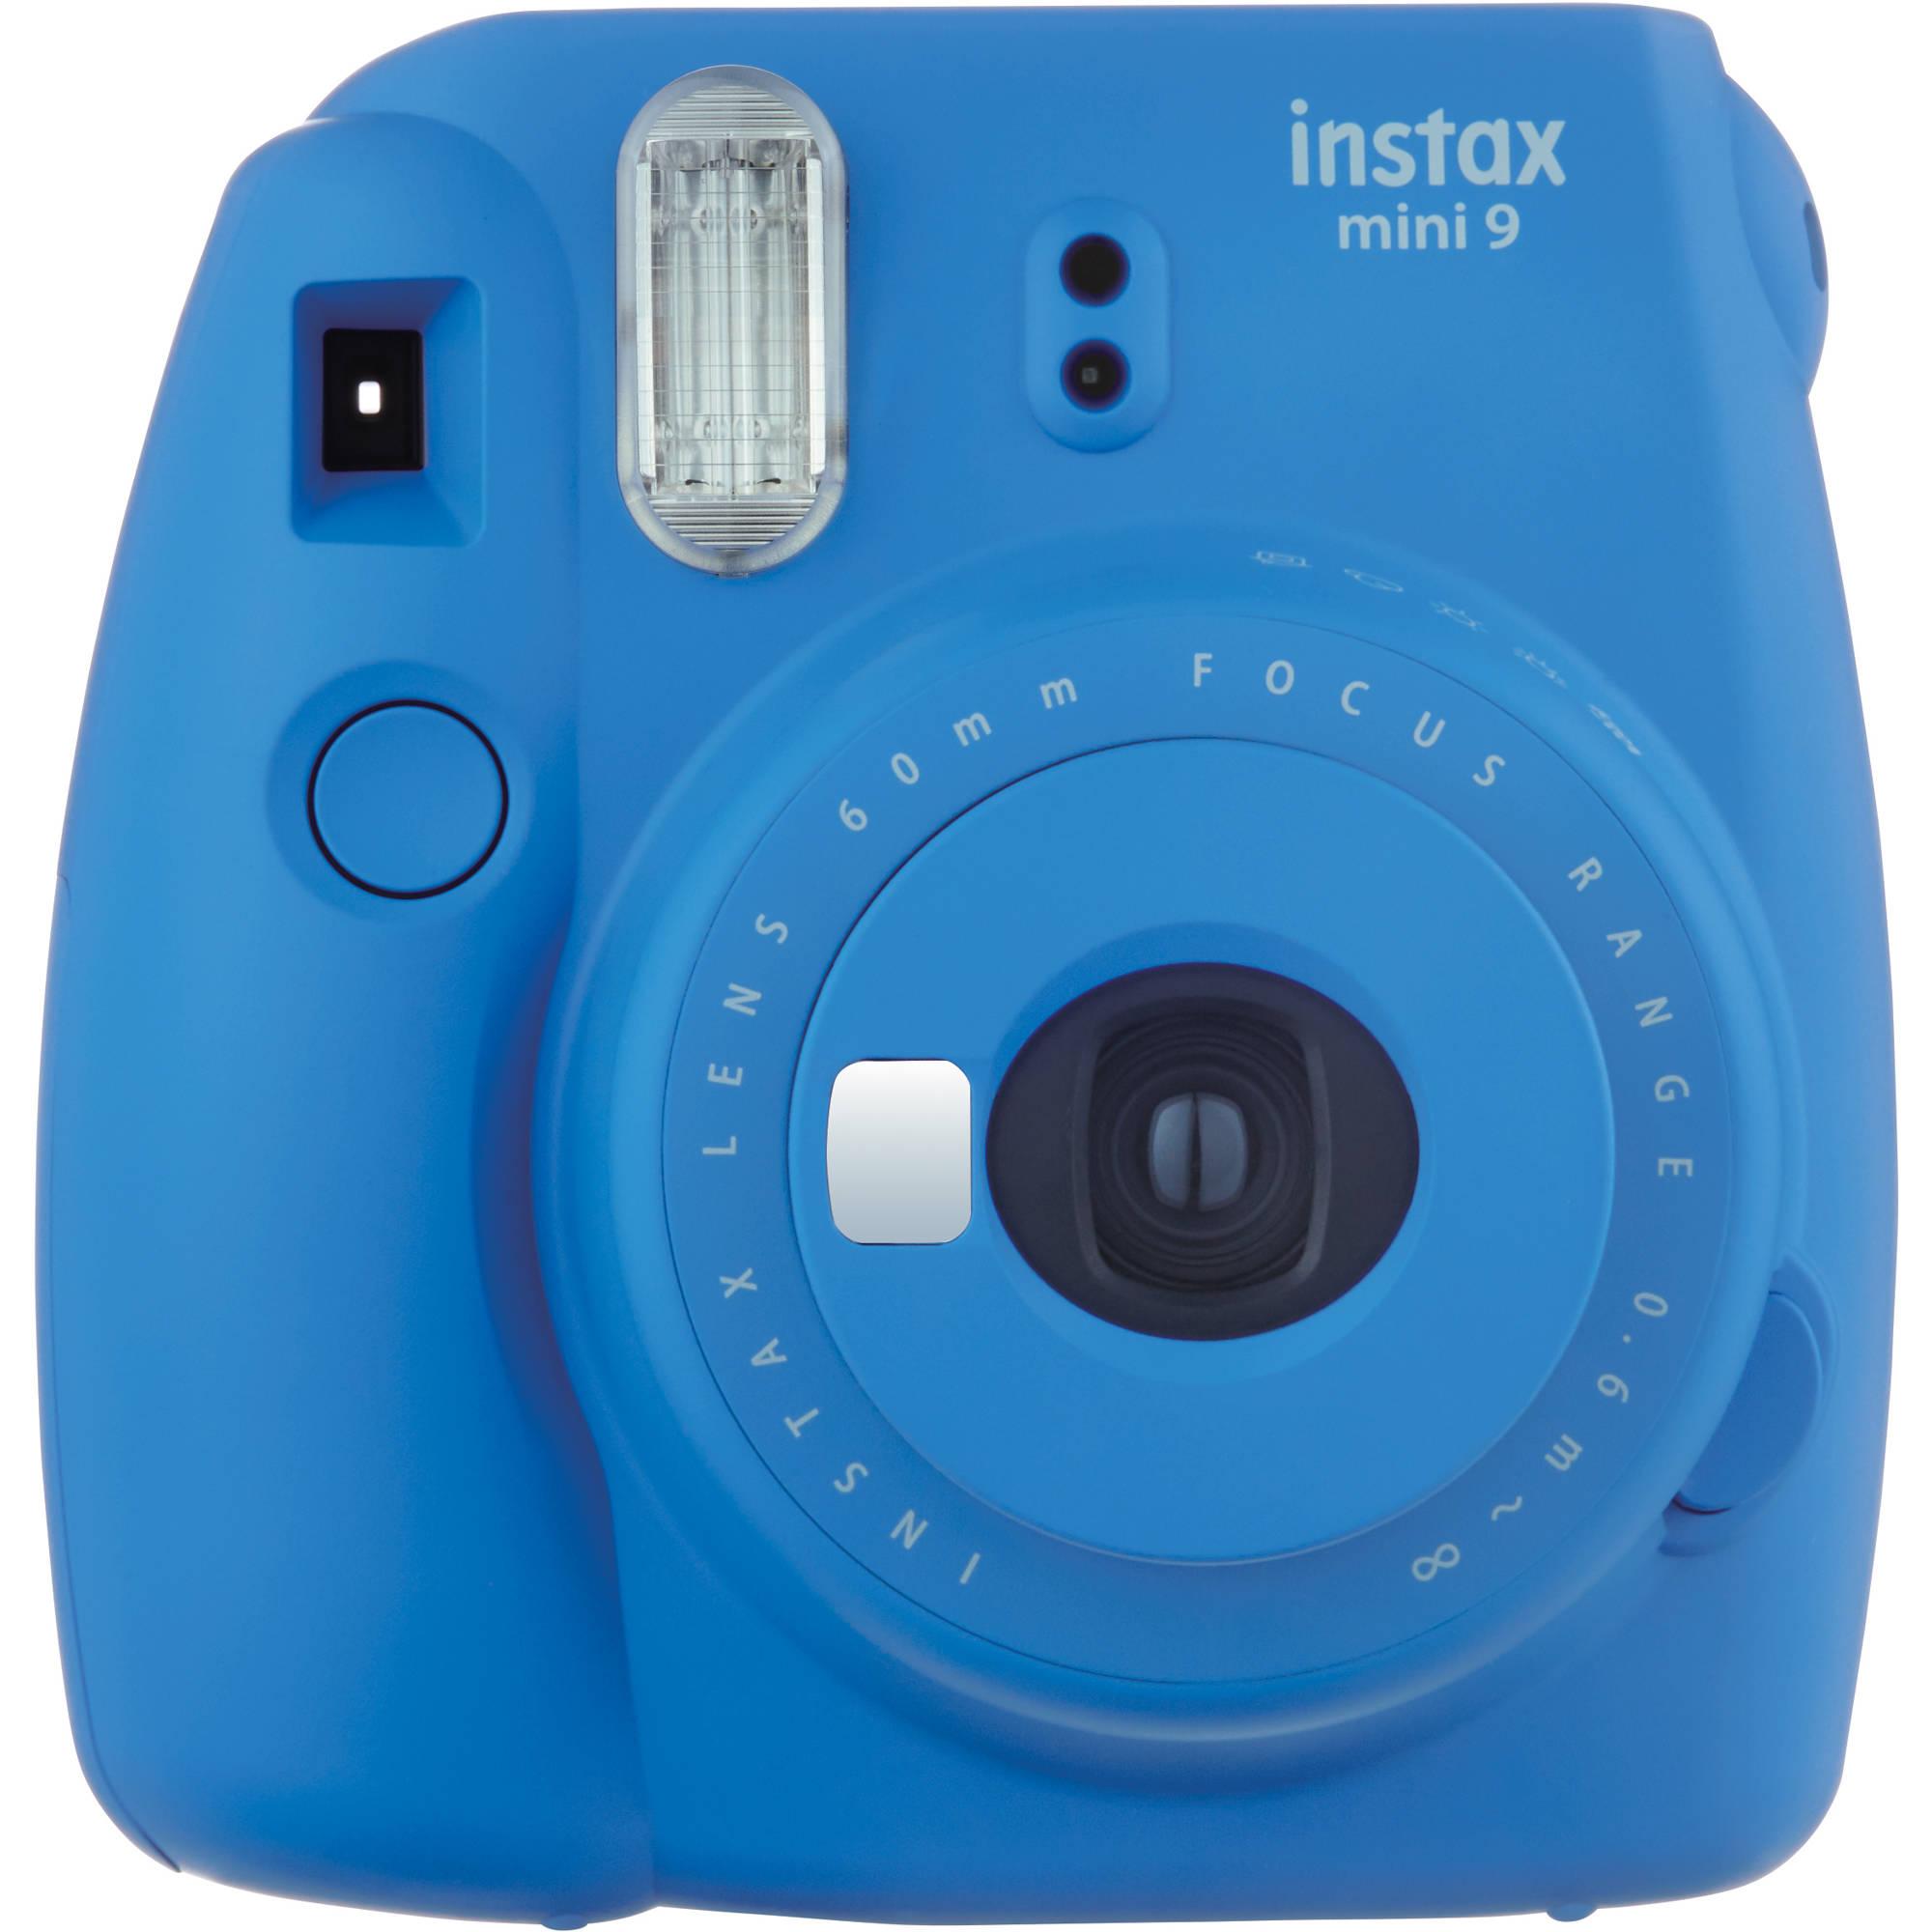 ProPhoto_Fujifilm instax mini 9 Colbat Blue